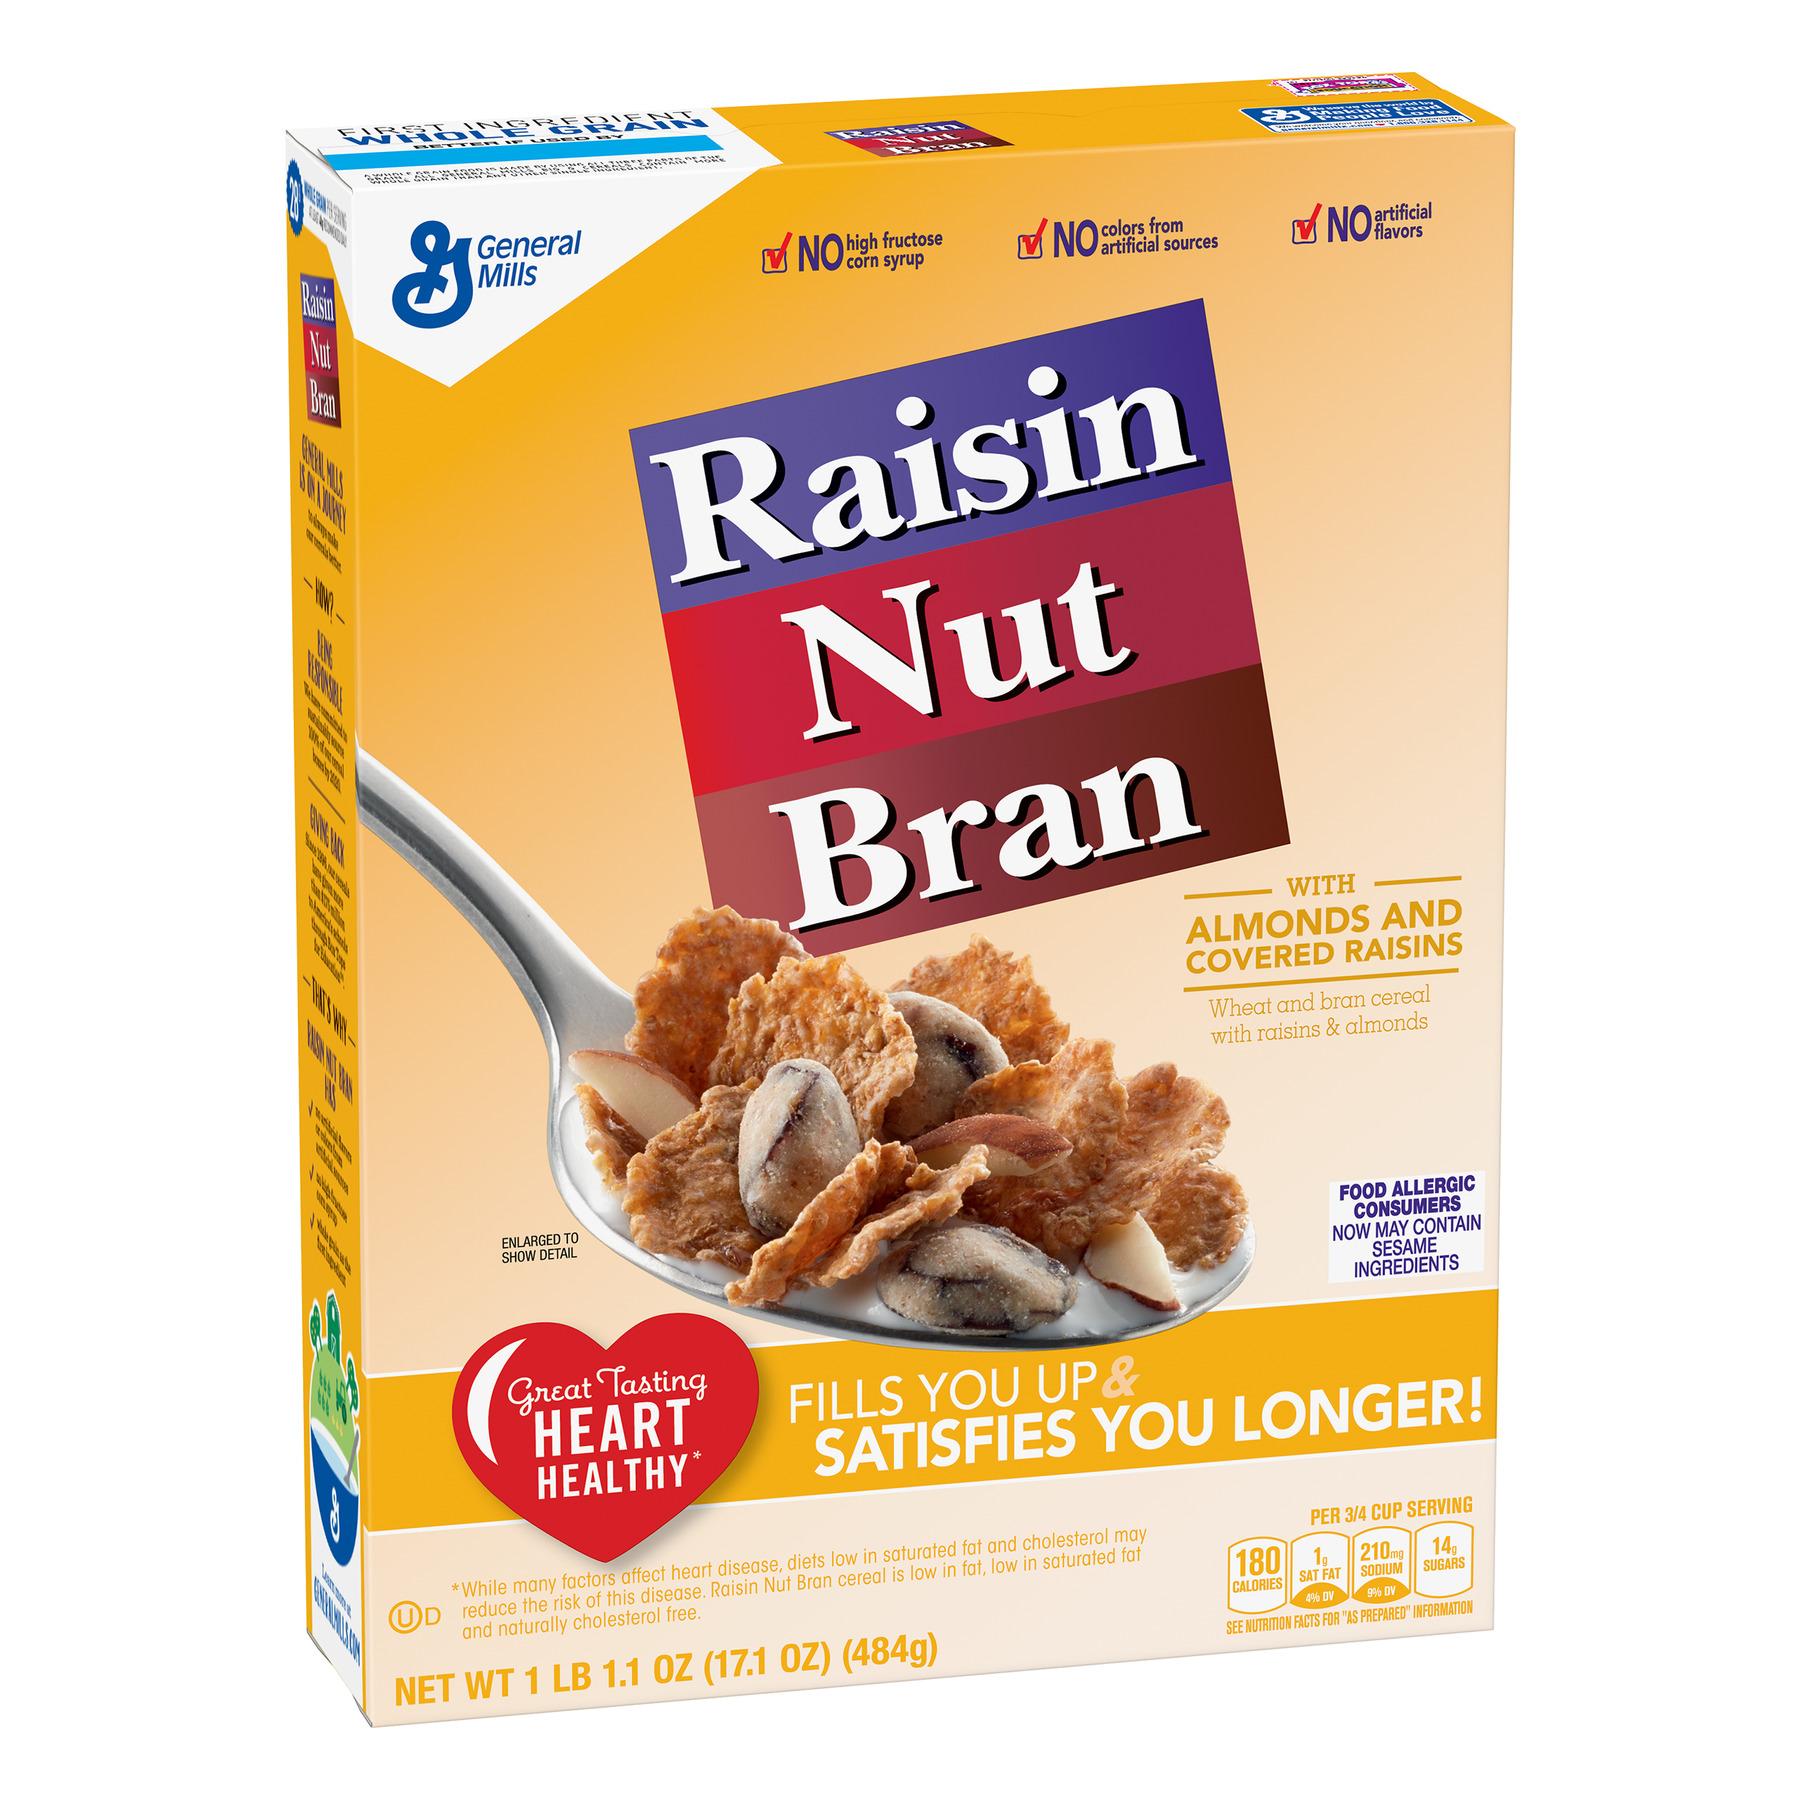 Raisin Nut Bran Breakfast Cereal, 17.1 oz Box